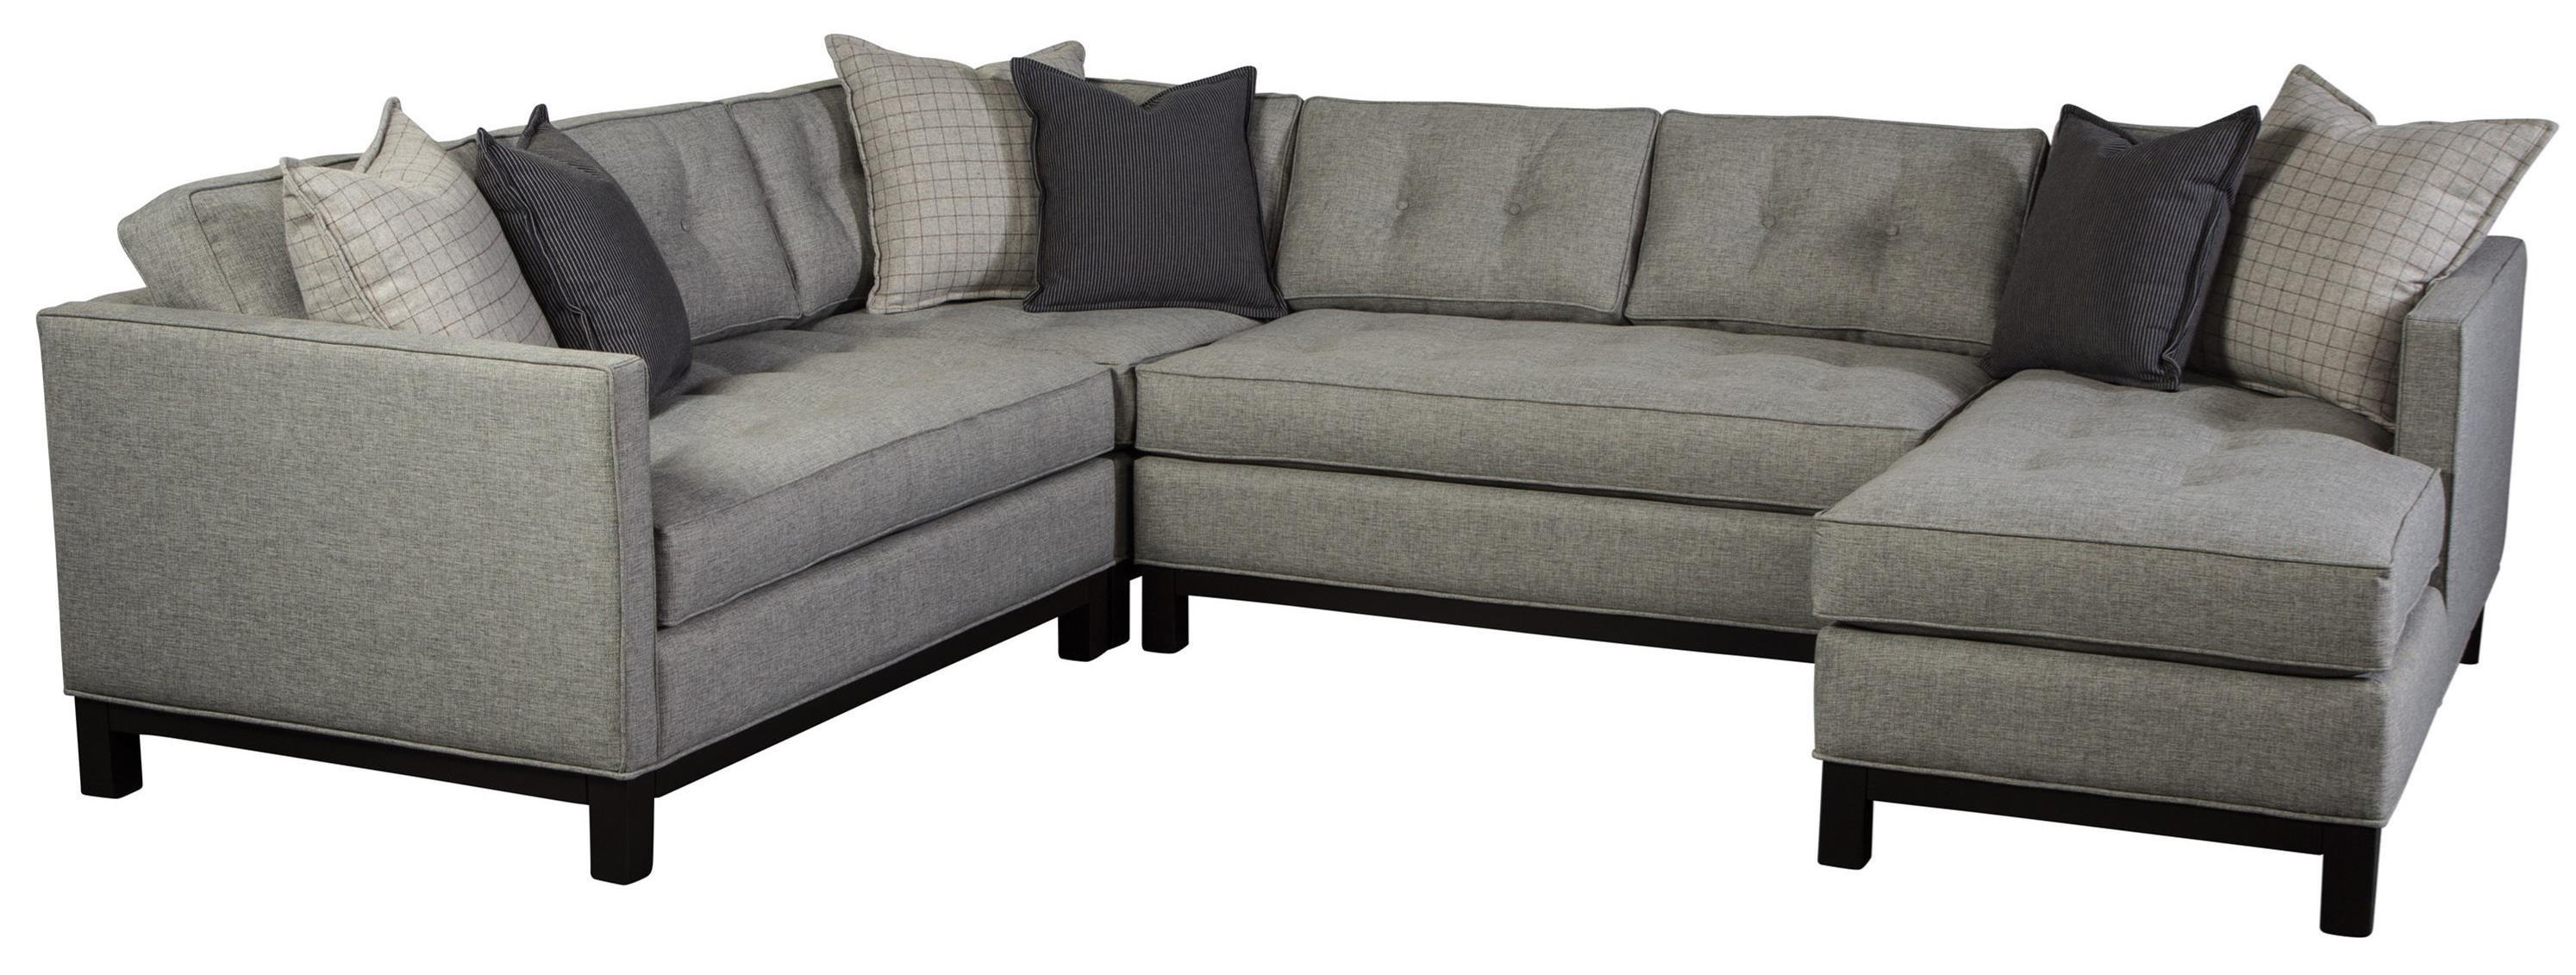 Jonathan Louis GoodwynSectional Sofa